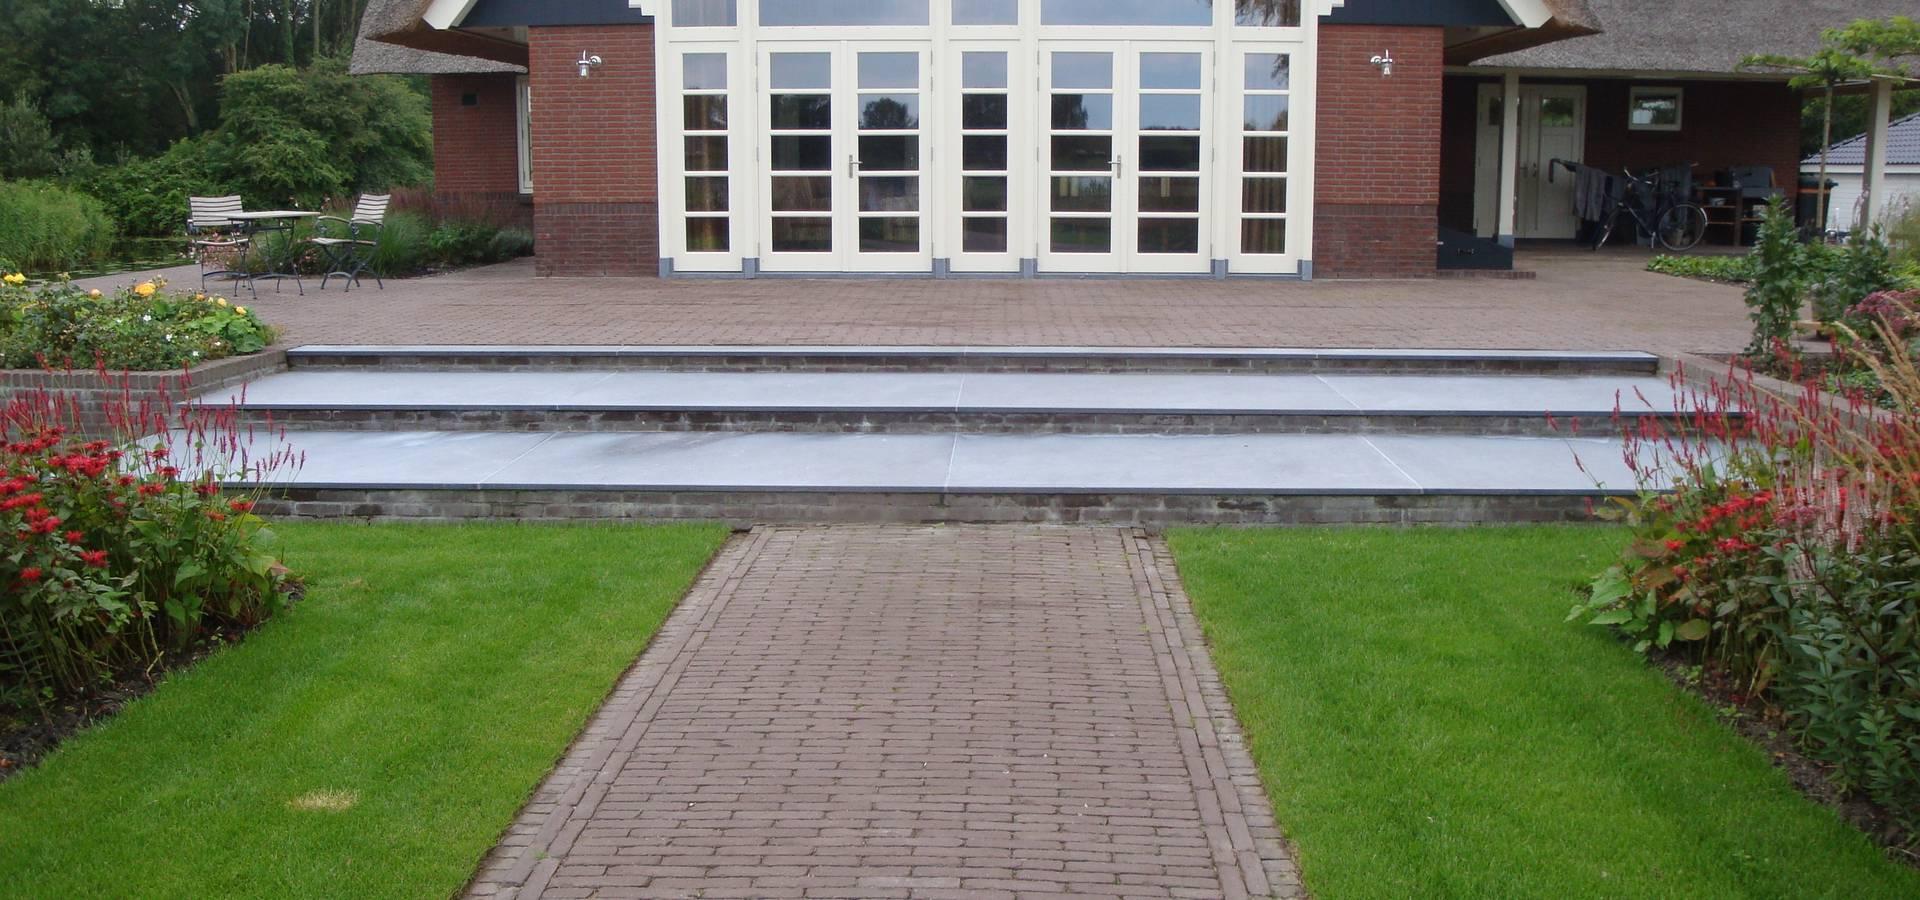 Degroenewand.nl